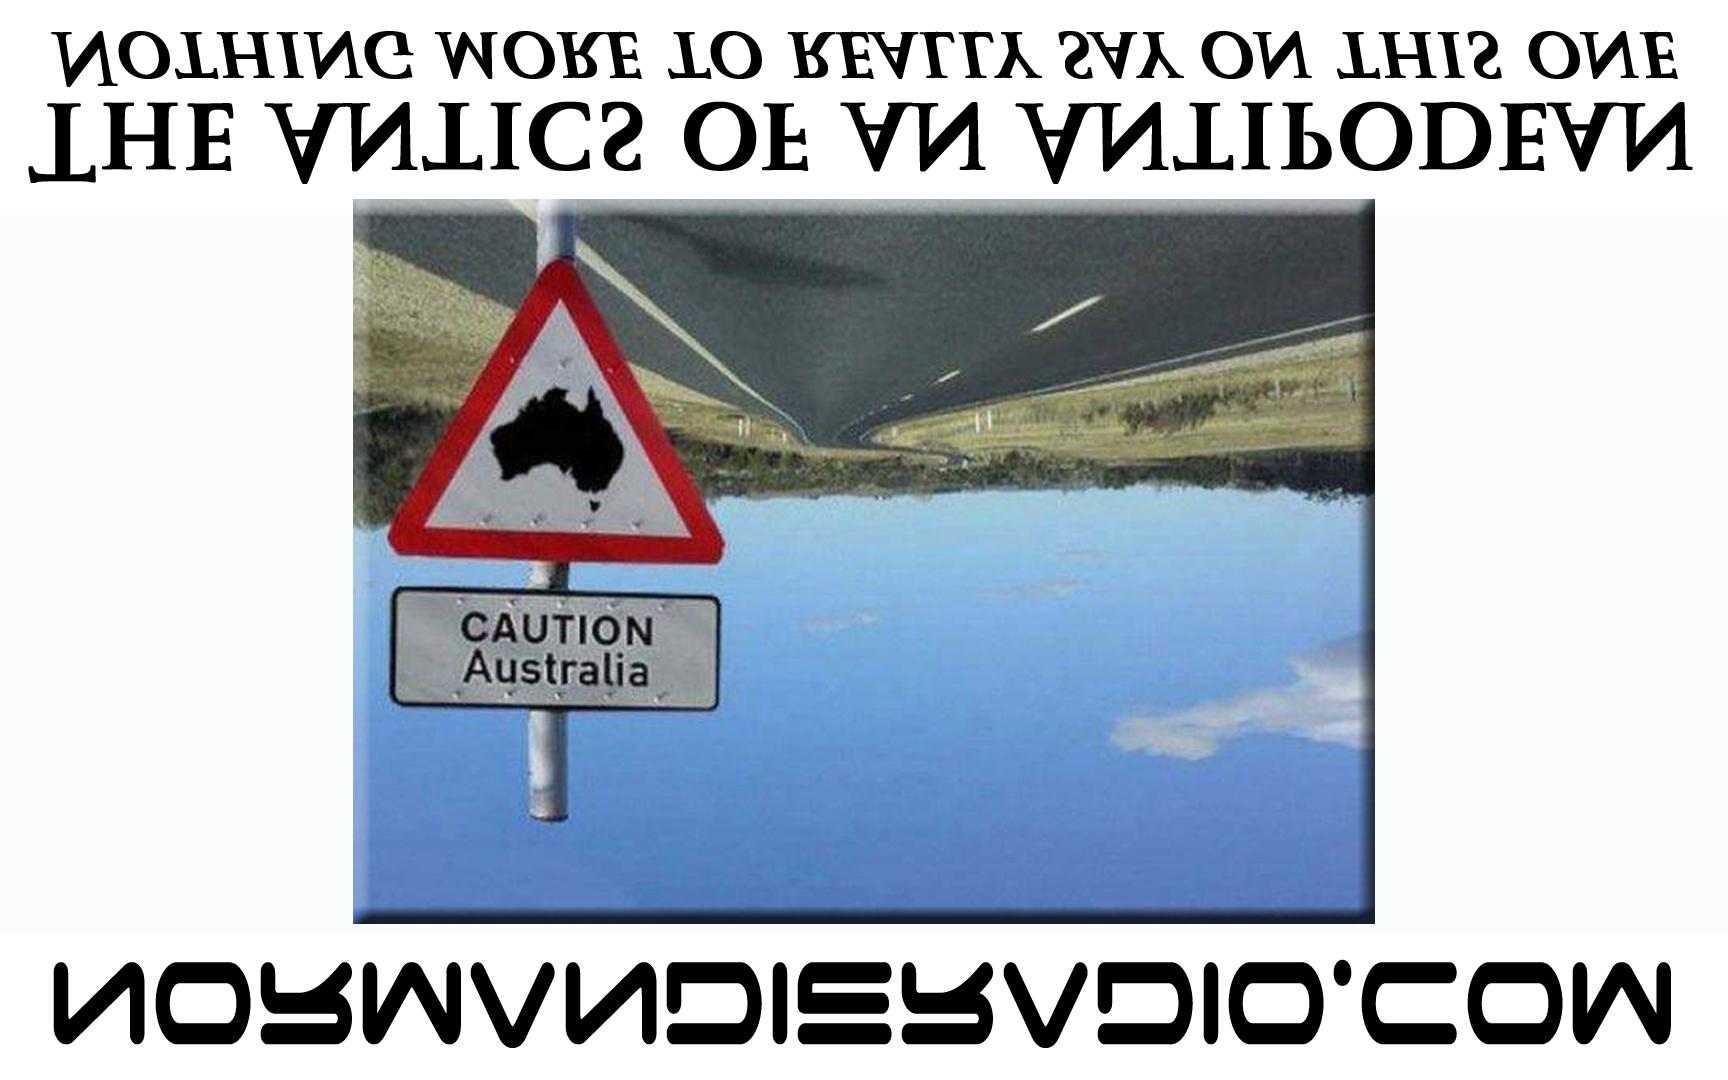 Antipodean_Caution copy.jpg